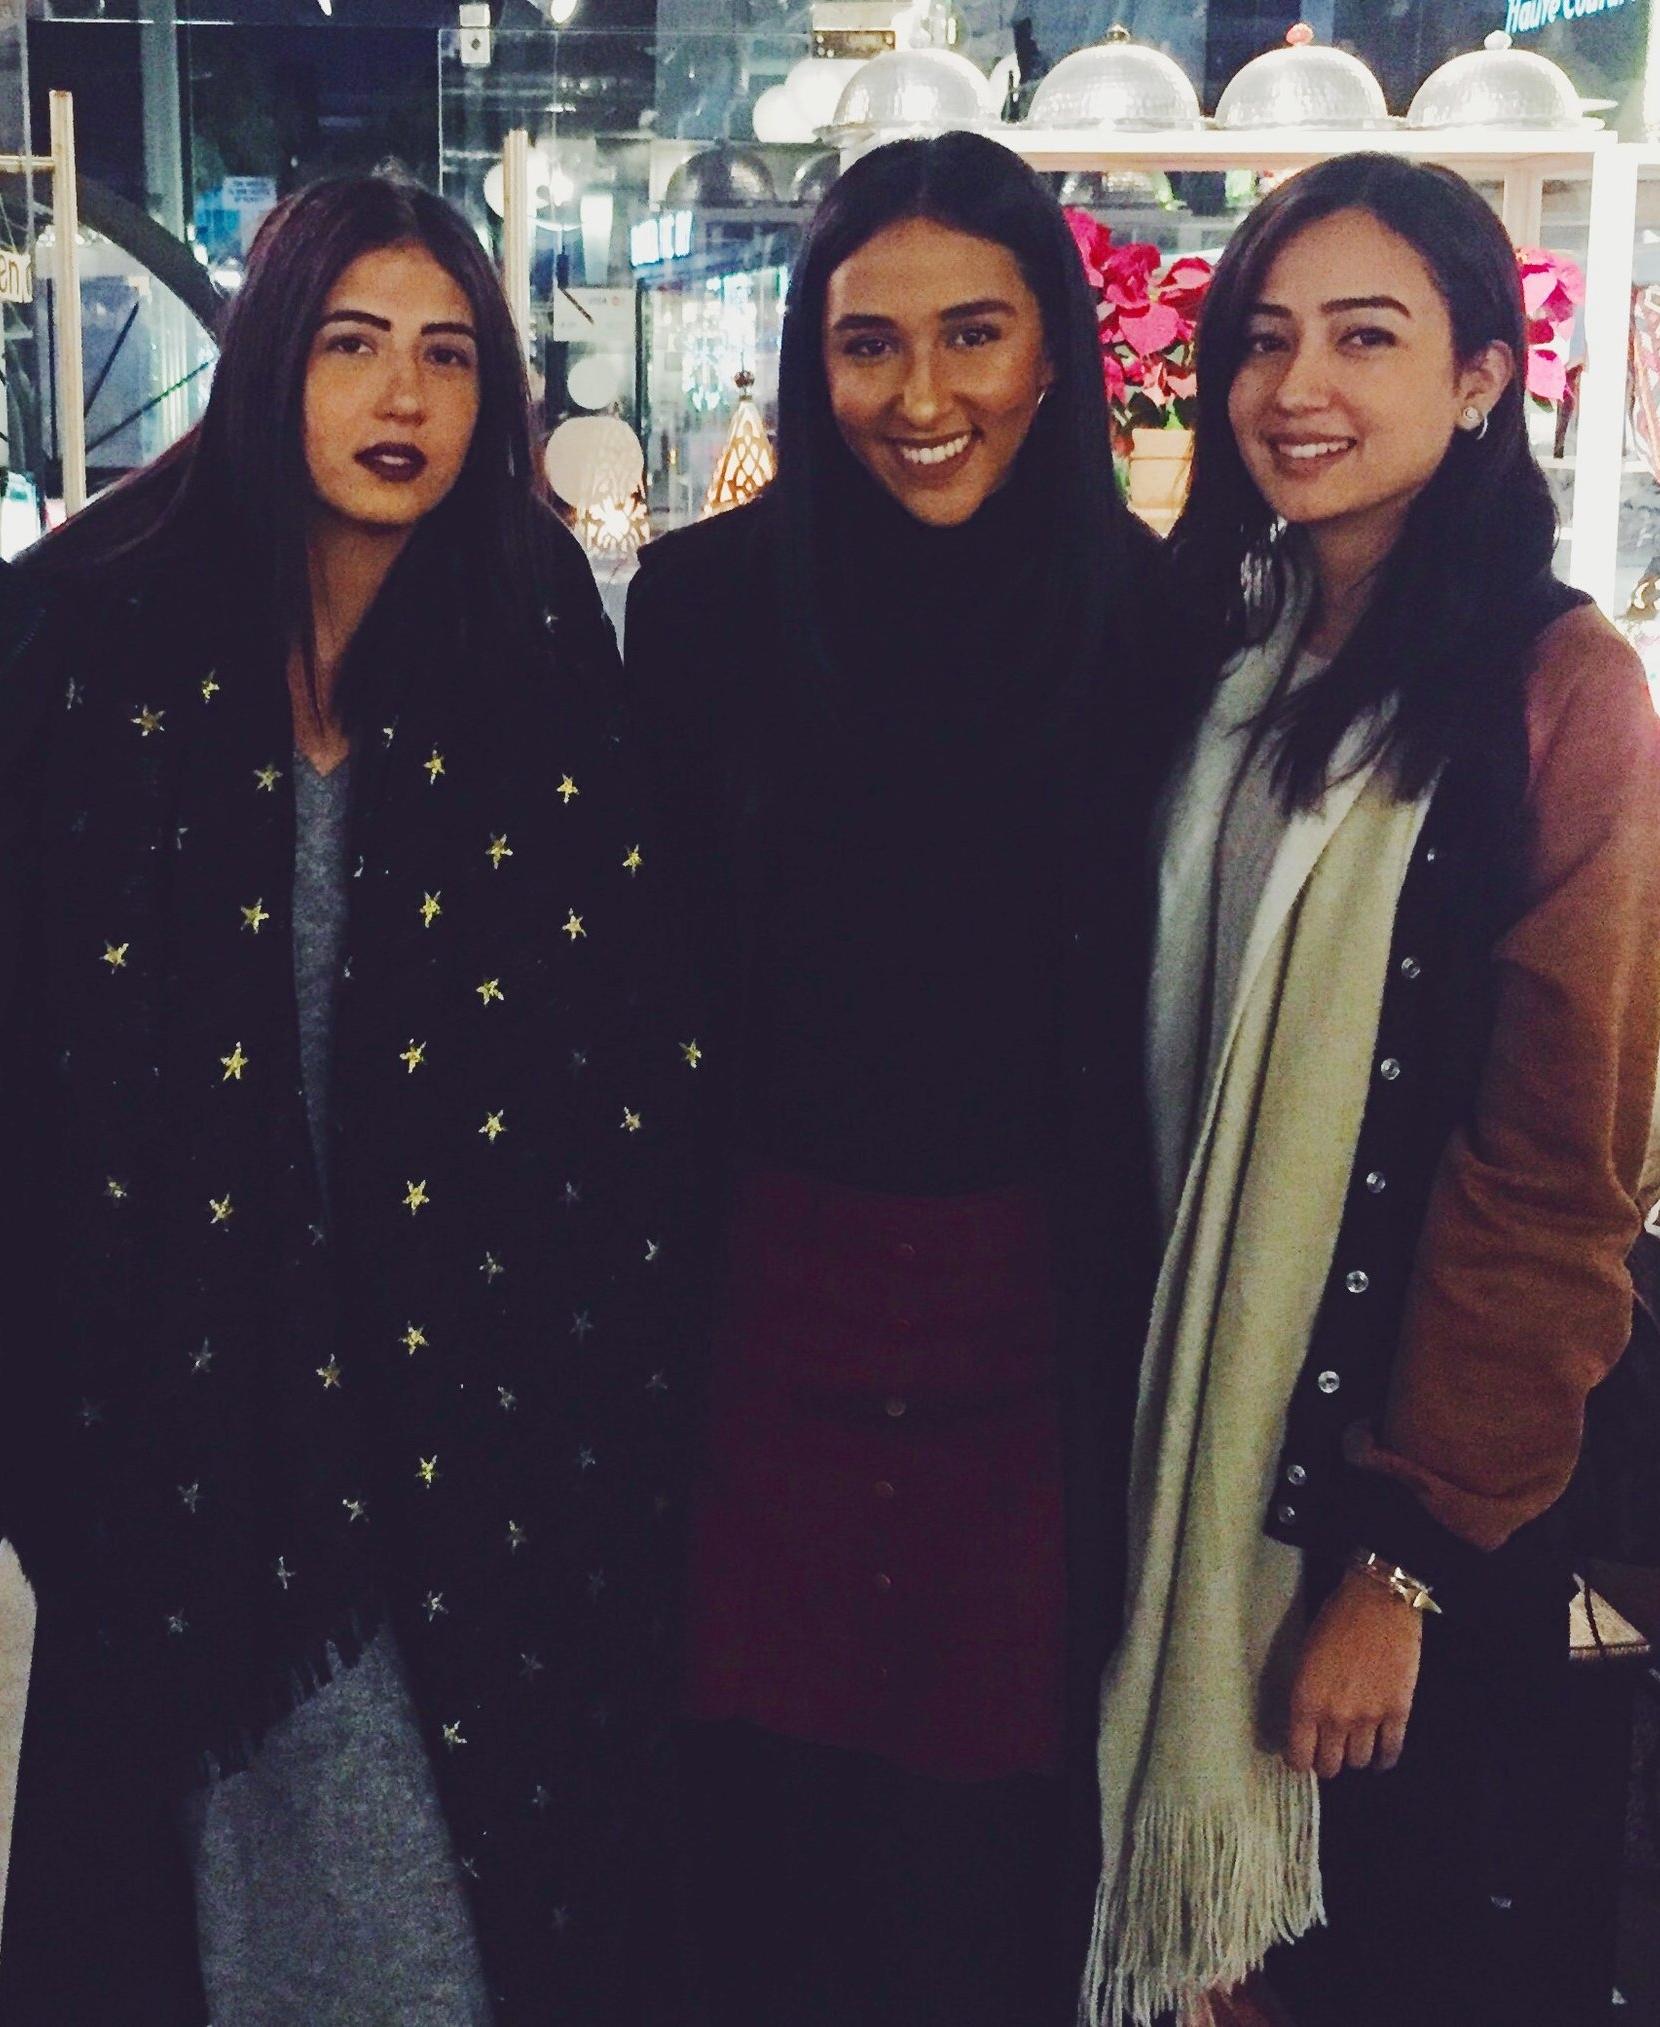 Left to right:  Mounaz Abdelraouf co-founder of OKHTEIN, Radwa El Ziki of Zedified, Aya Abdelraouf co-founder of OKHTEIN.